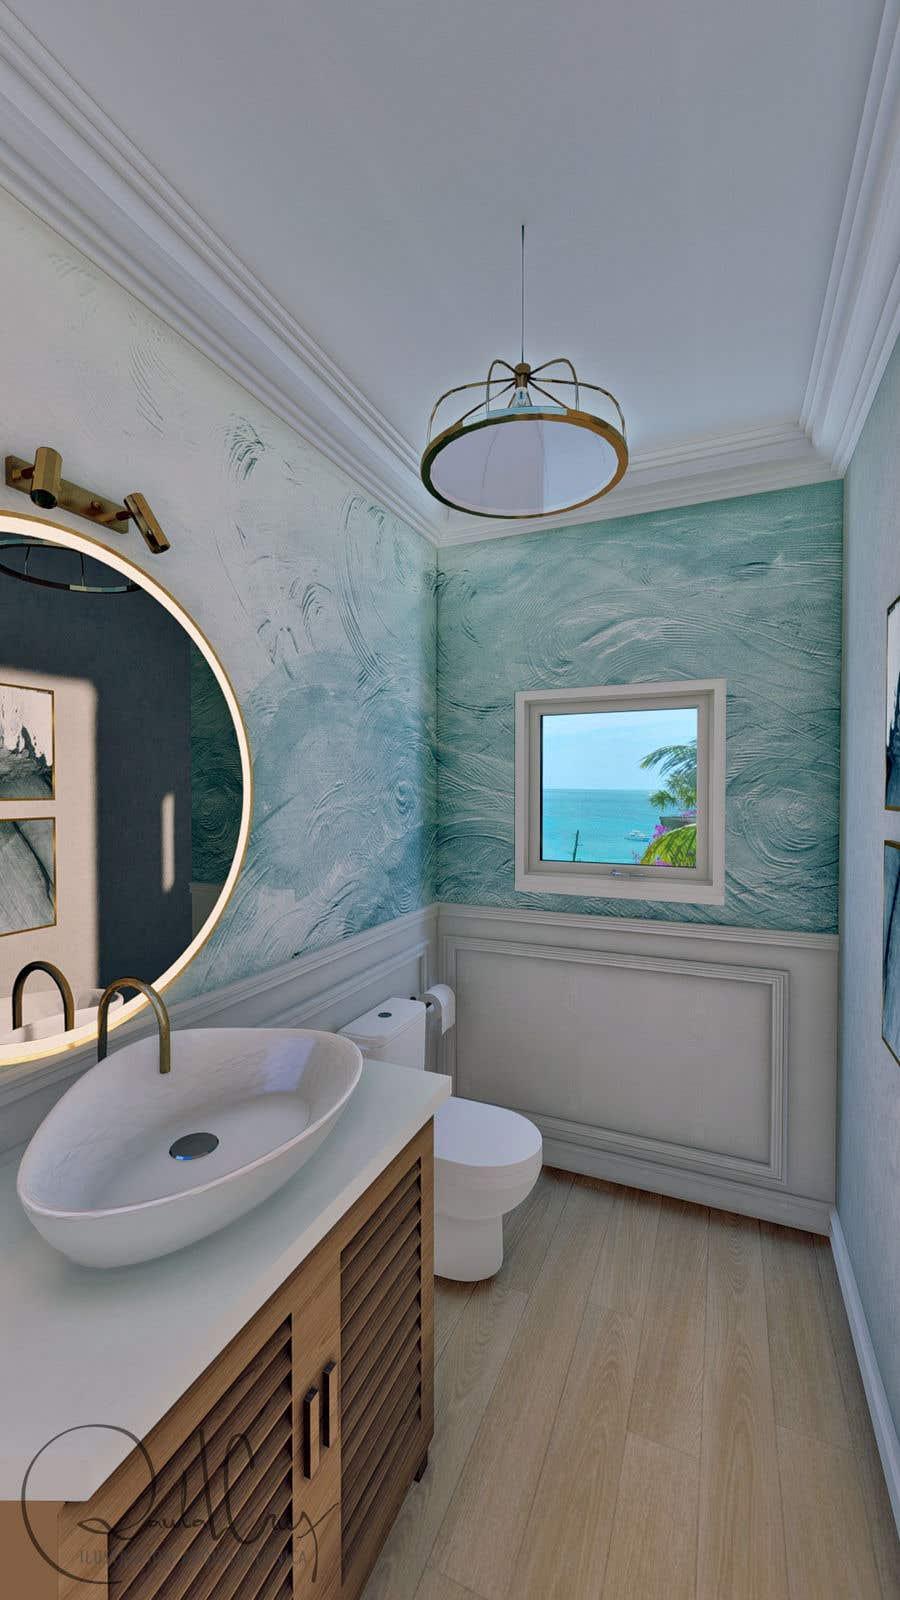 Bài tham dự cuộc thi #                                        44                                      cho                                         Half bath interior design in 3d - coastal transitional design style